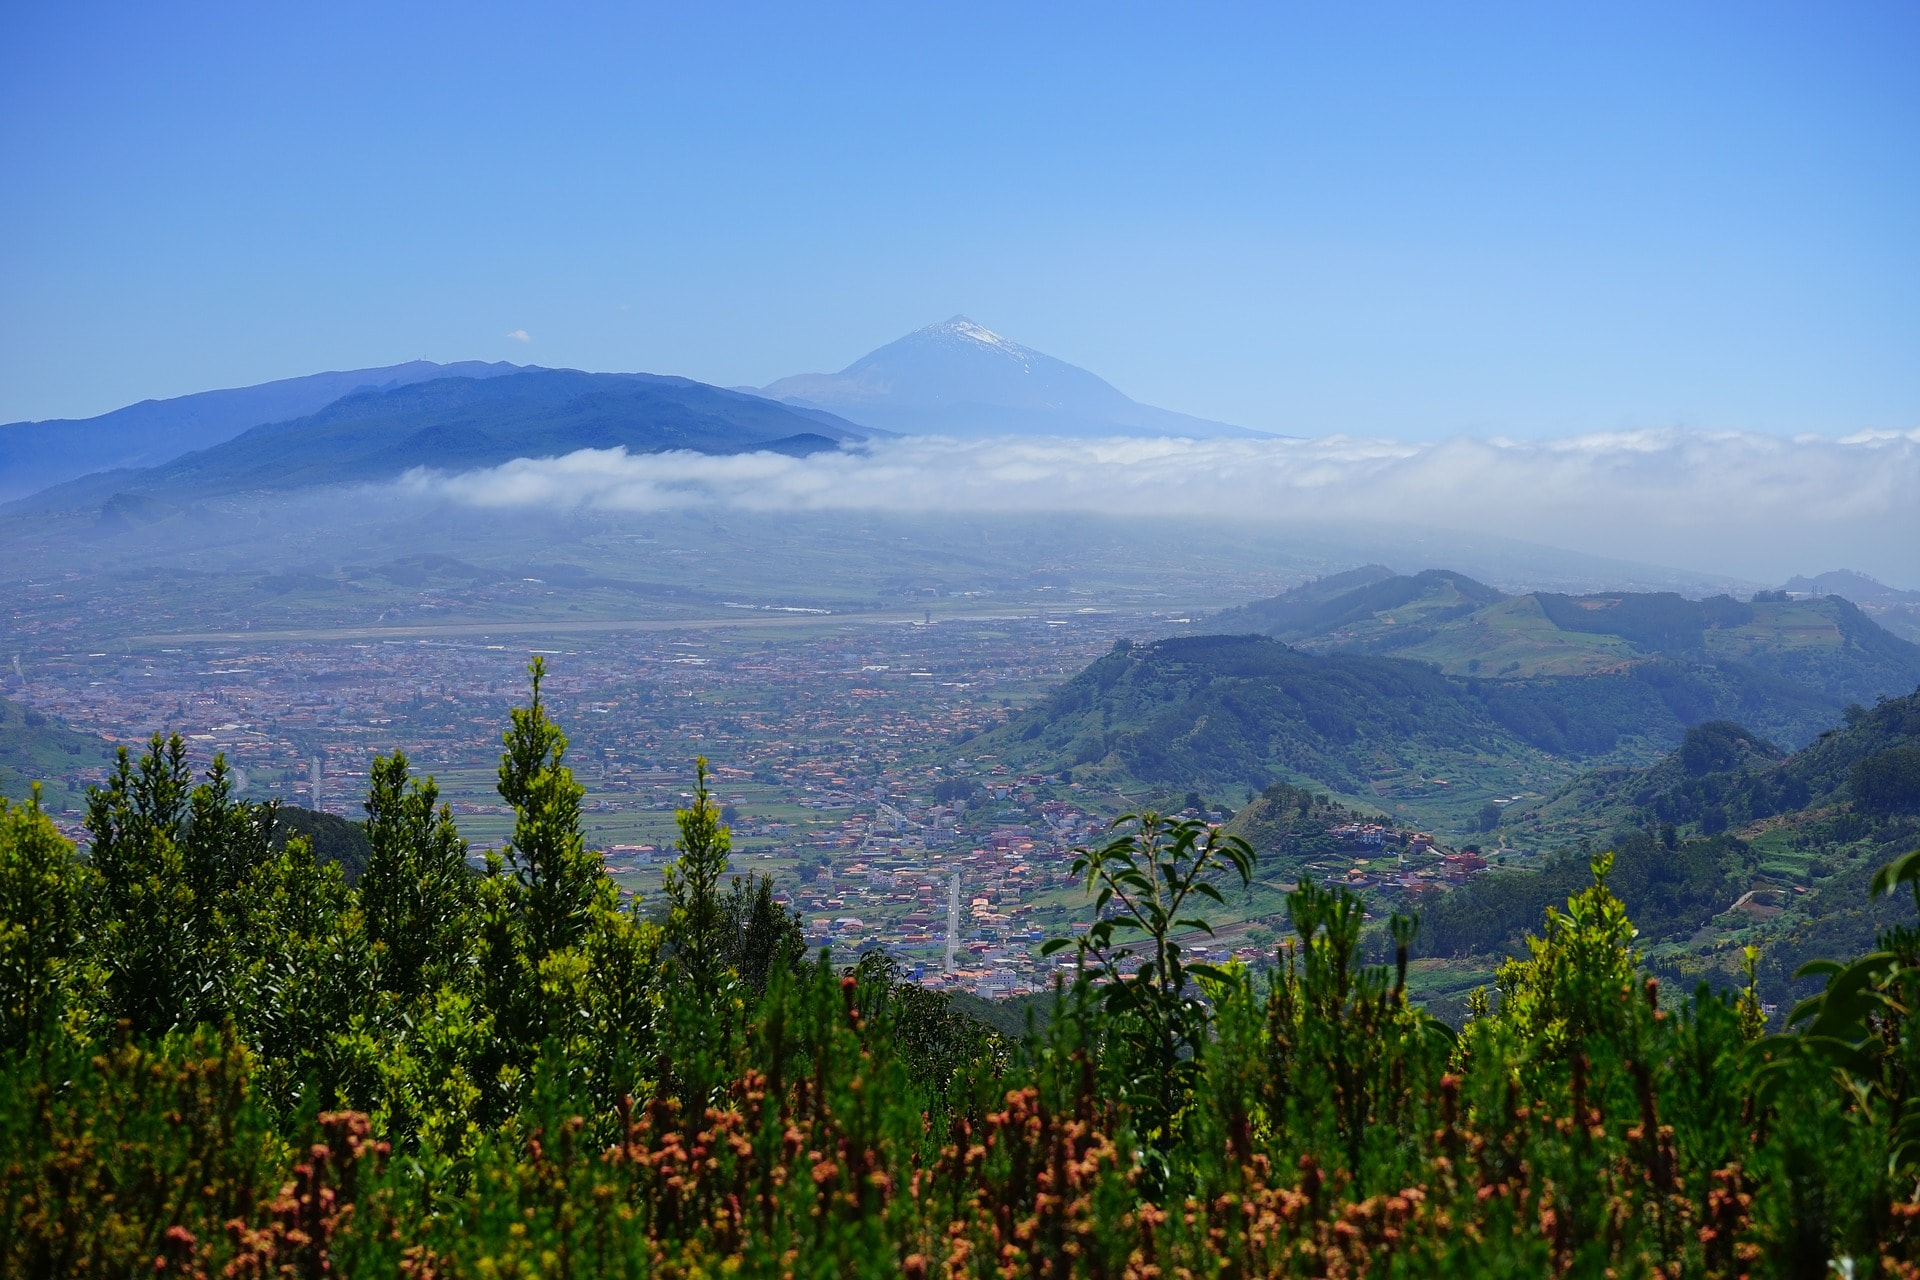 Panorama parc Teide Tenerife Canaries